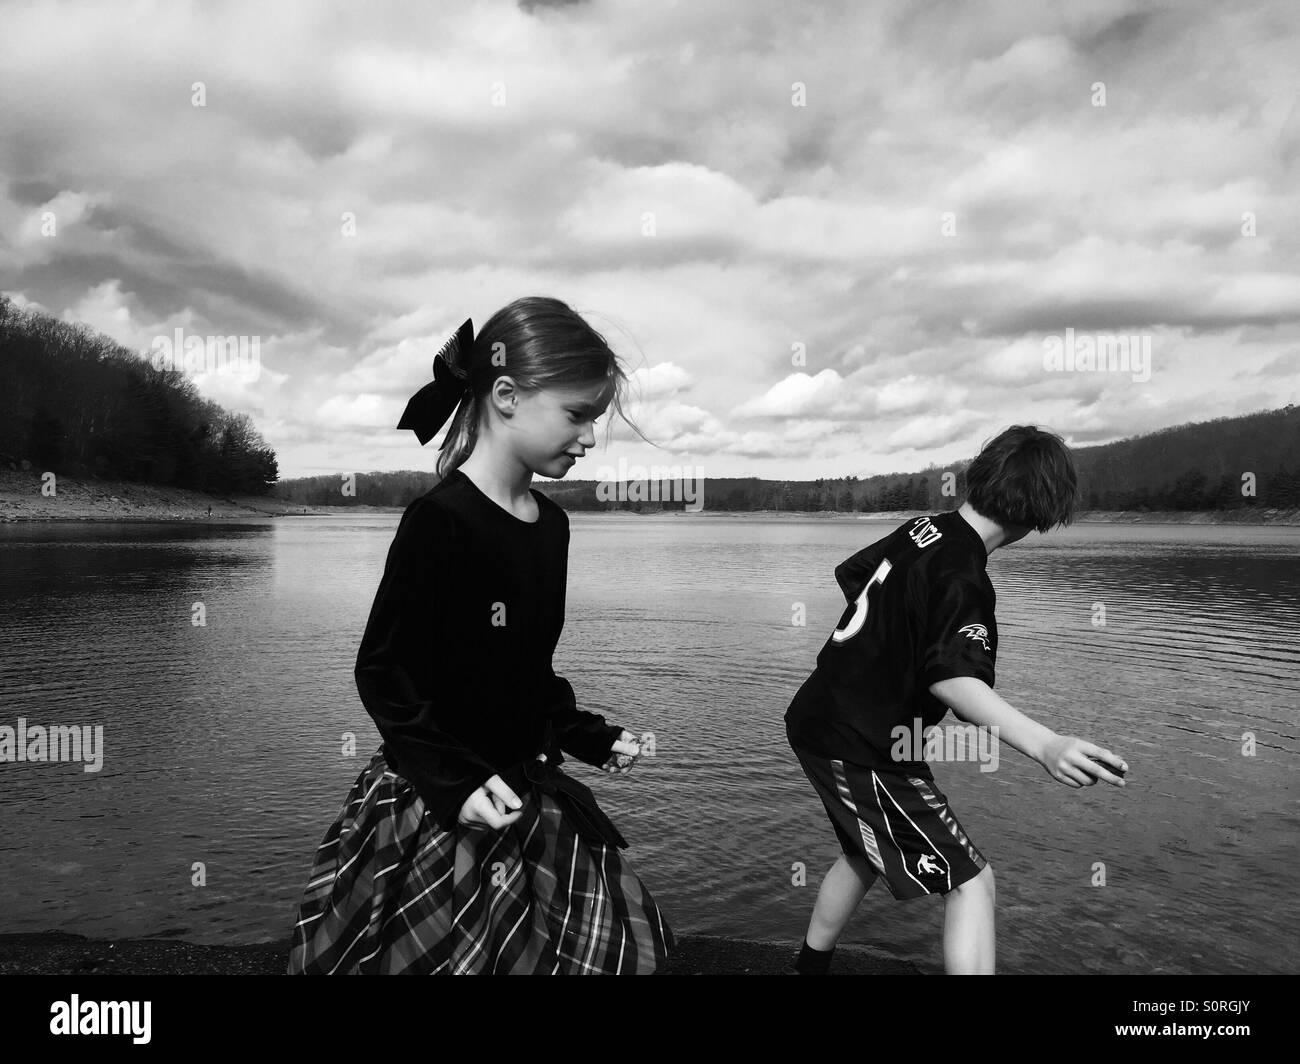 Children skipping stones - Stock Image